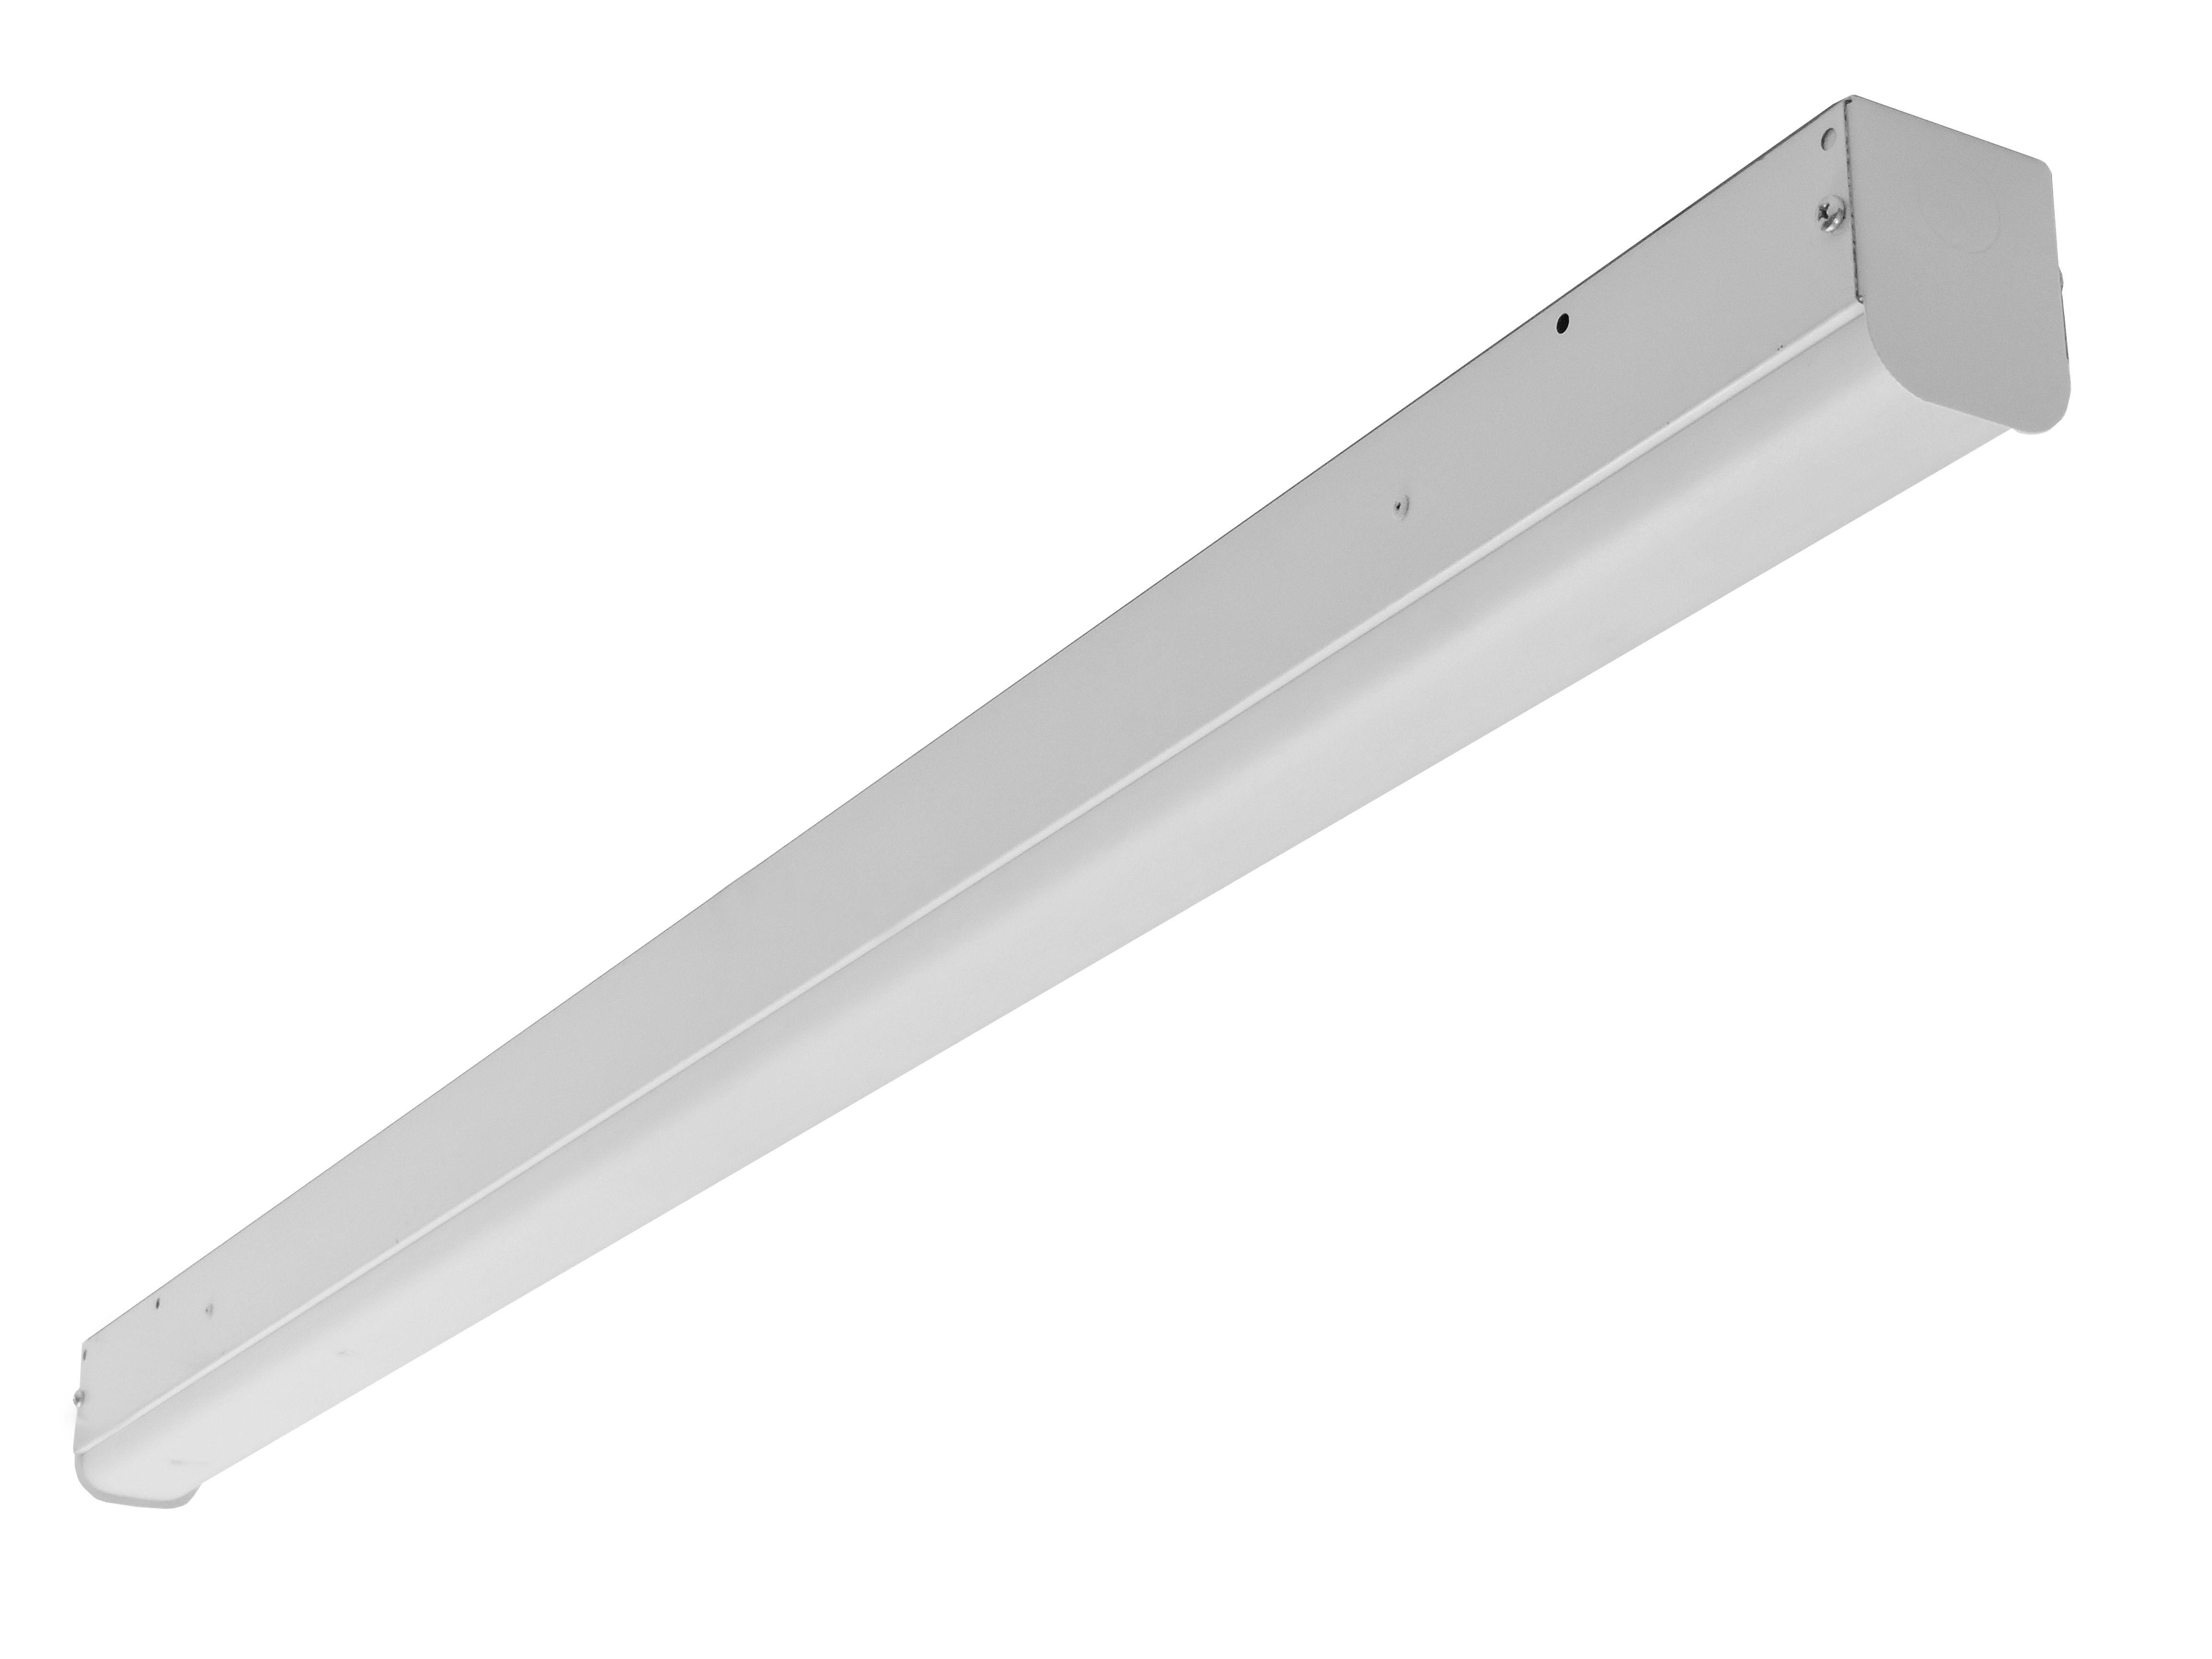 La Lighting 3 Stw100 Series 4 Foot Led Strip Lighting Fixture